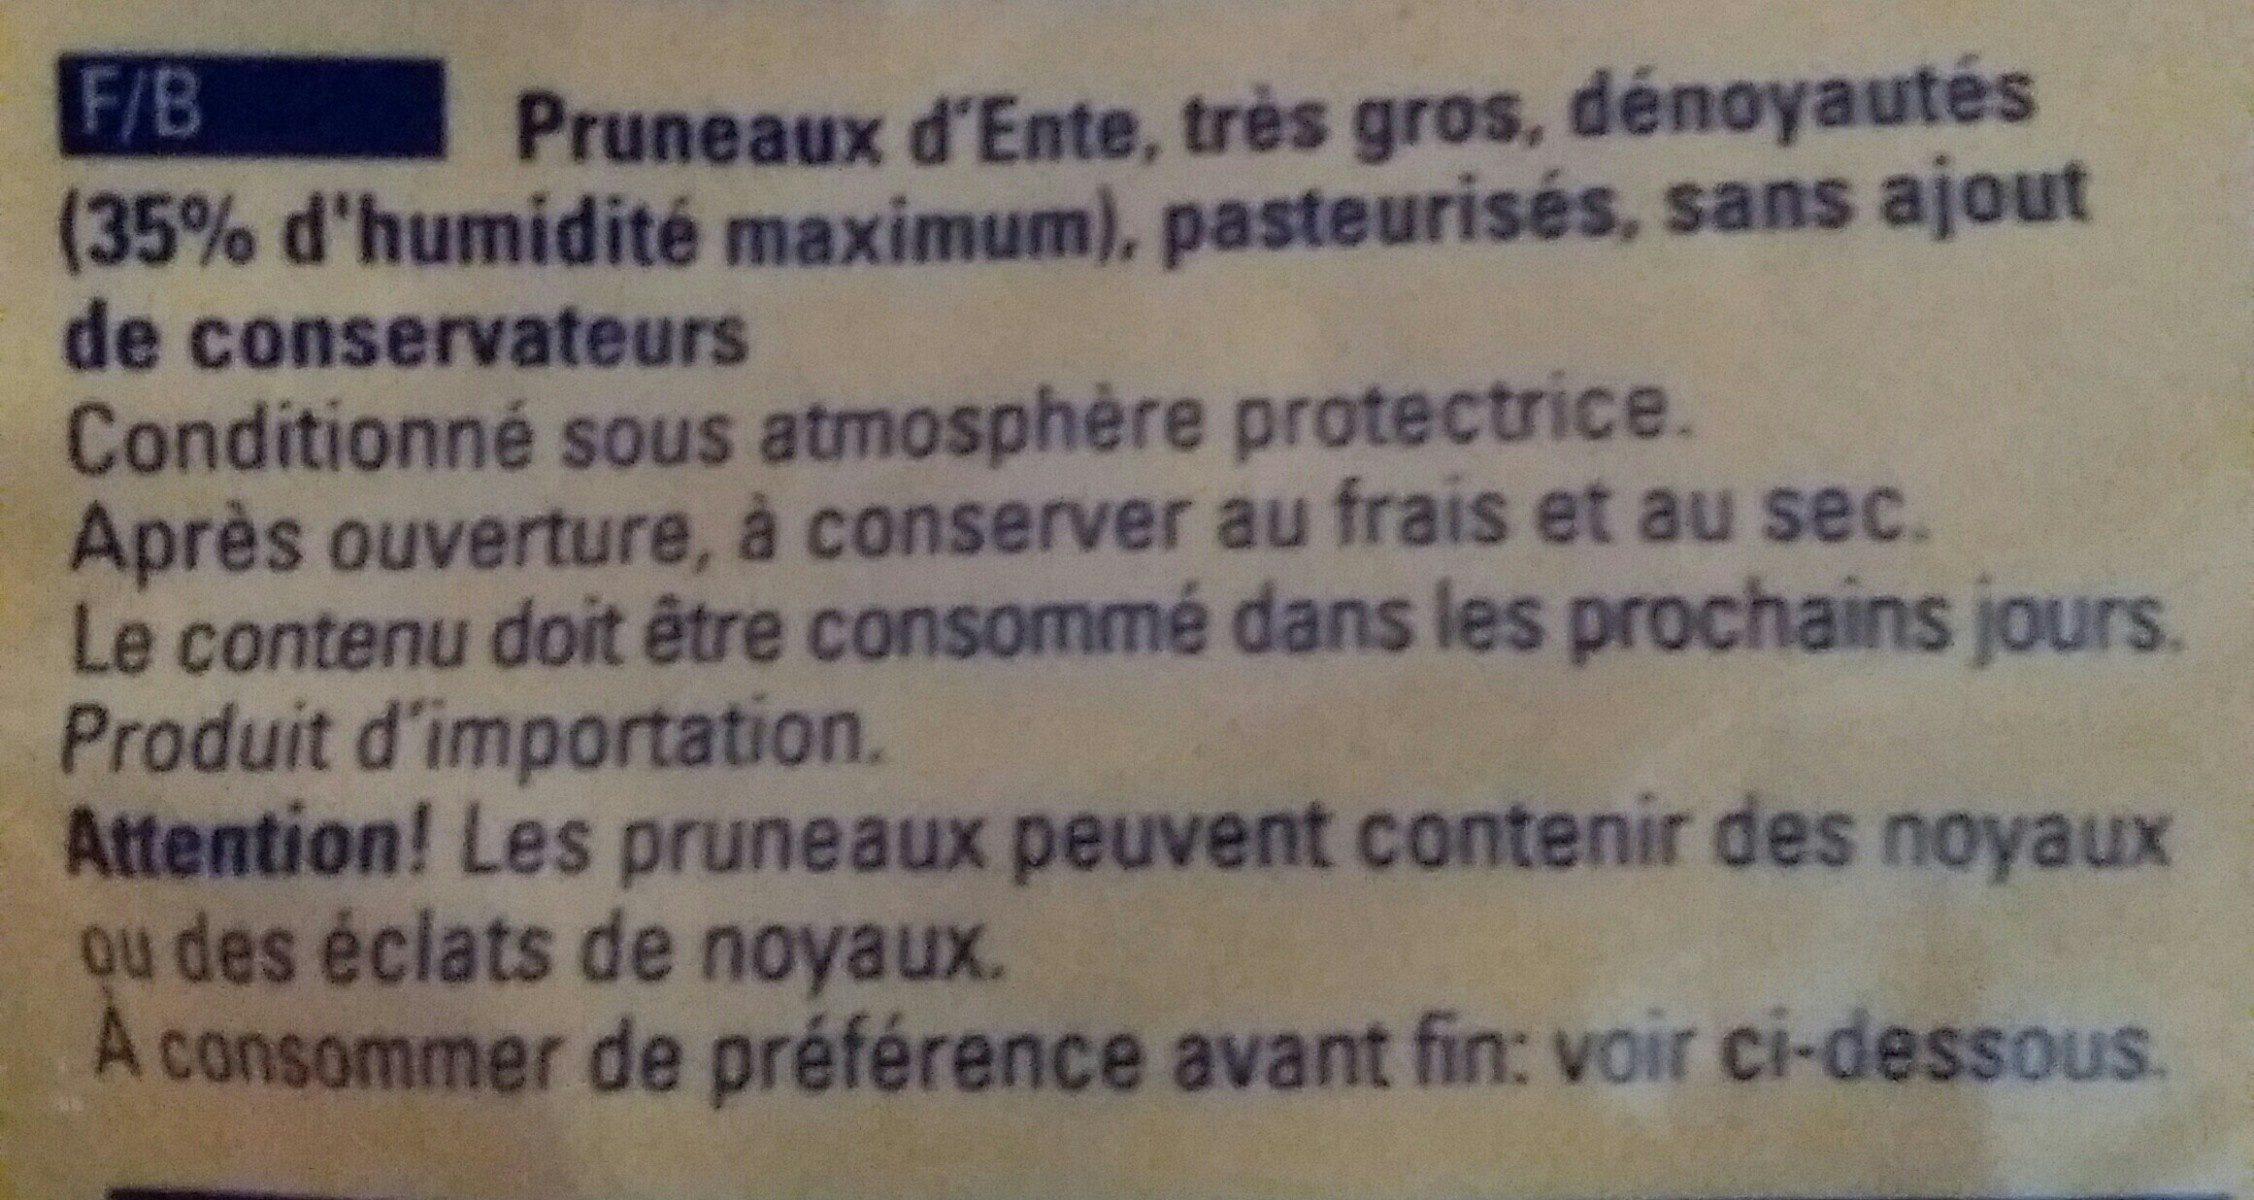 Pruneaux Softpflaumen - Ingrédients - fr